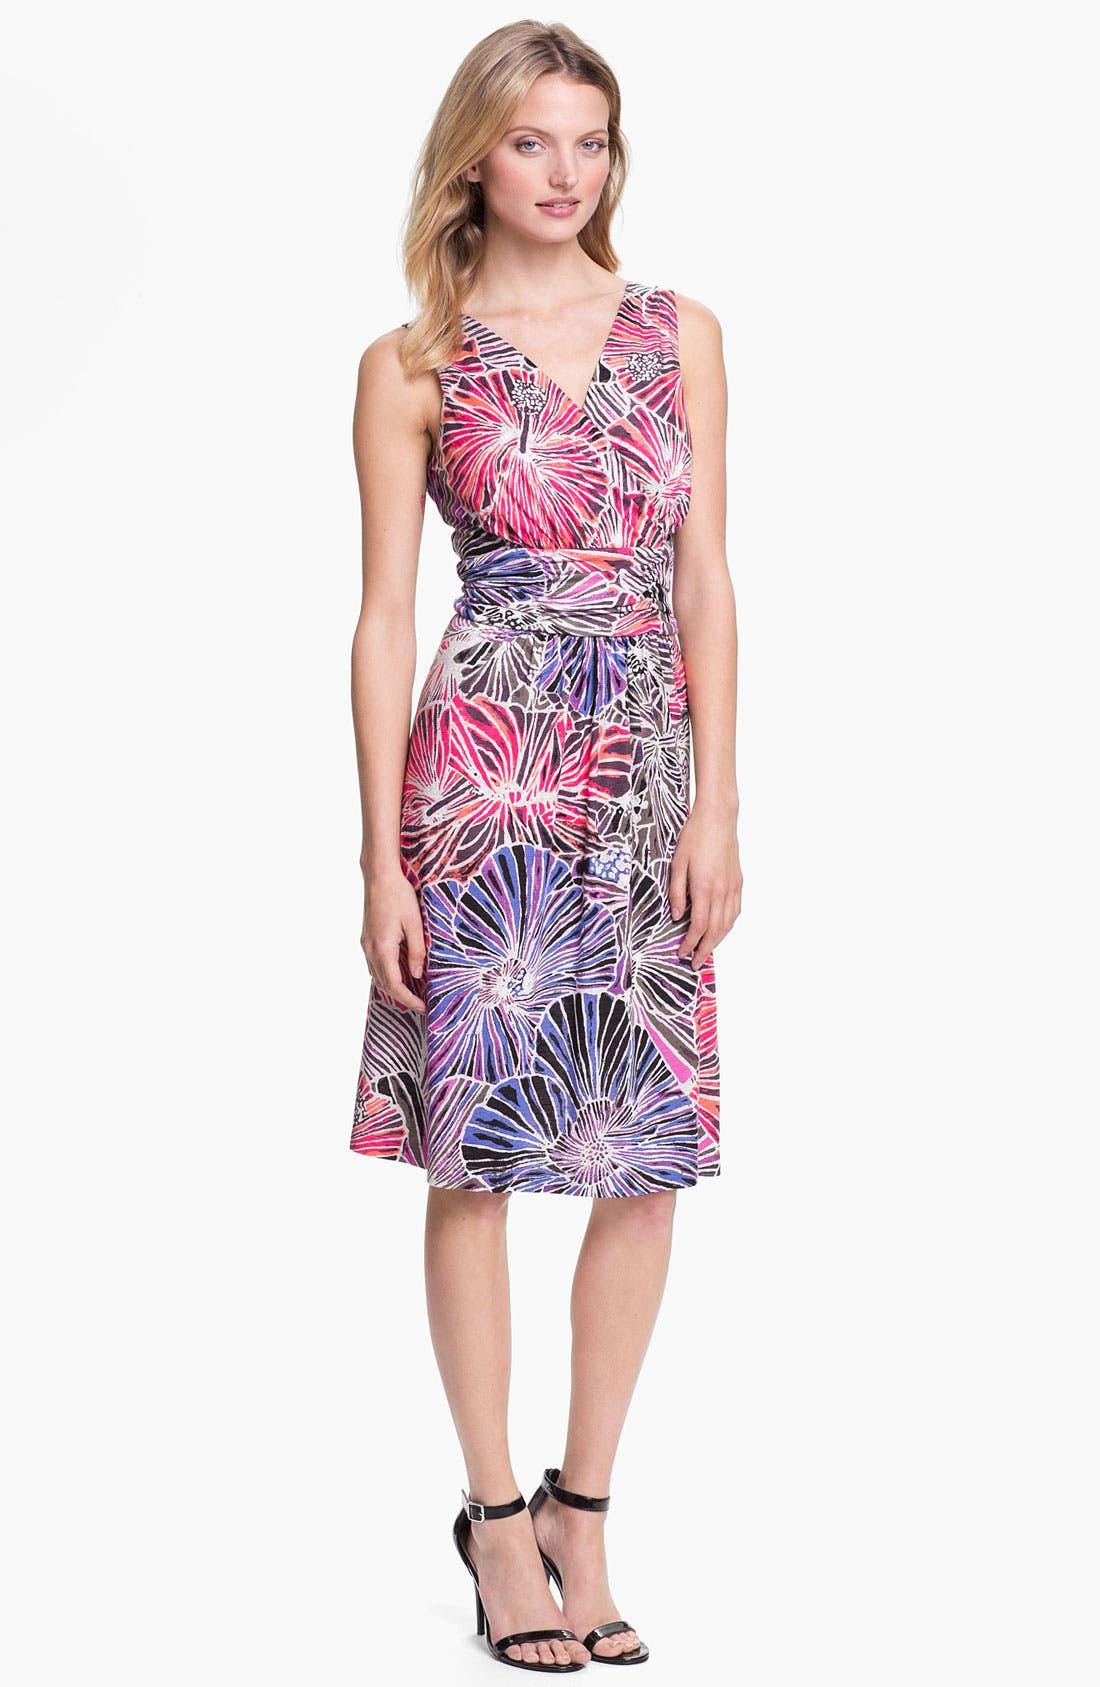 Main Image - Nic + Zoe Sleeveless Surplice V-Neck Print Dress